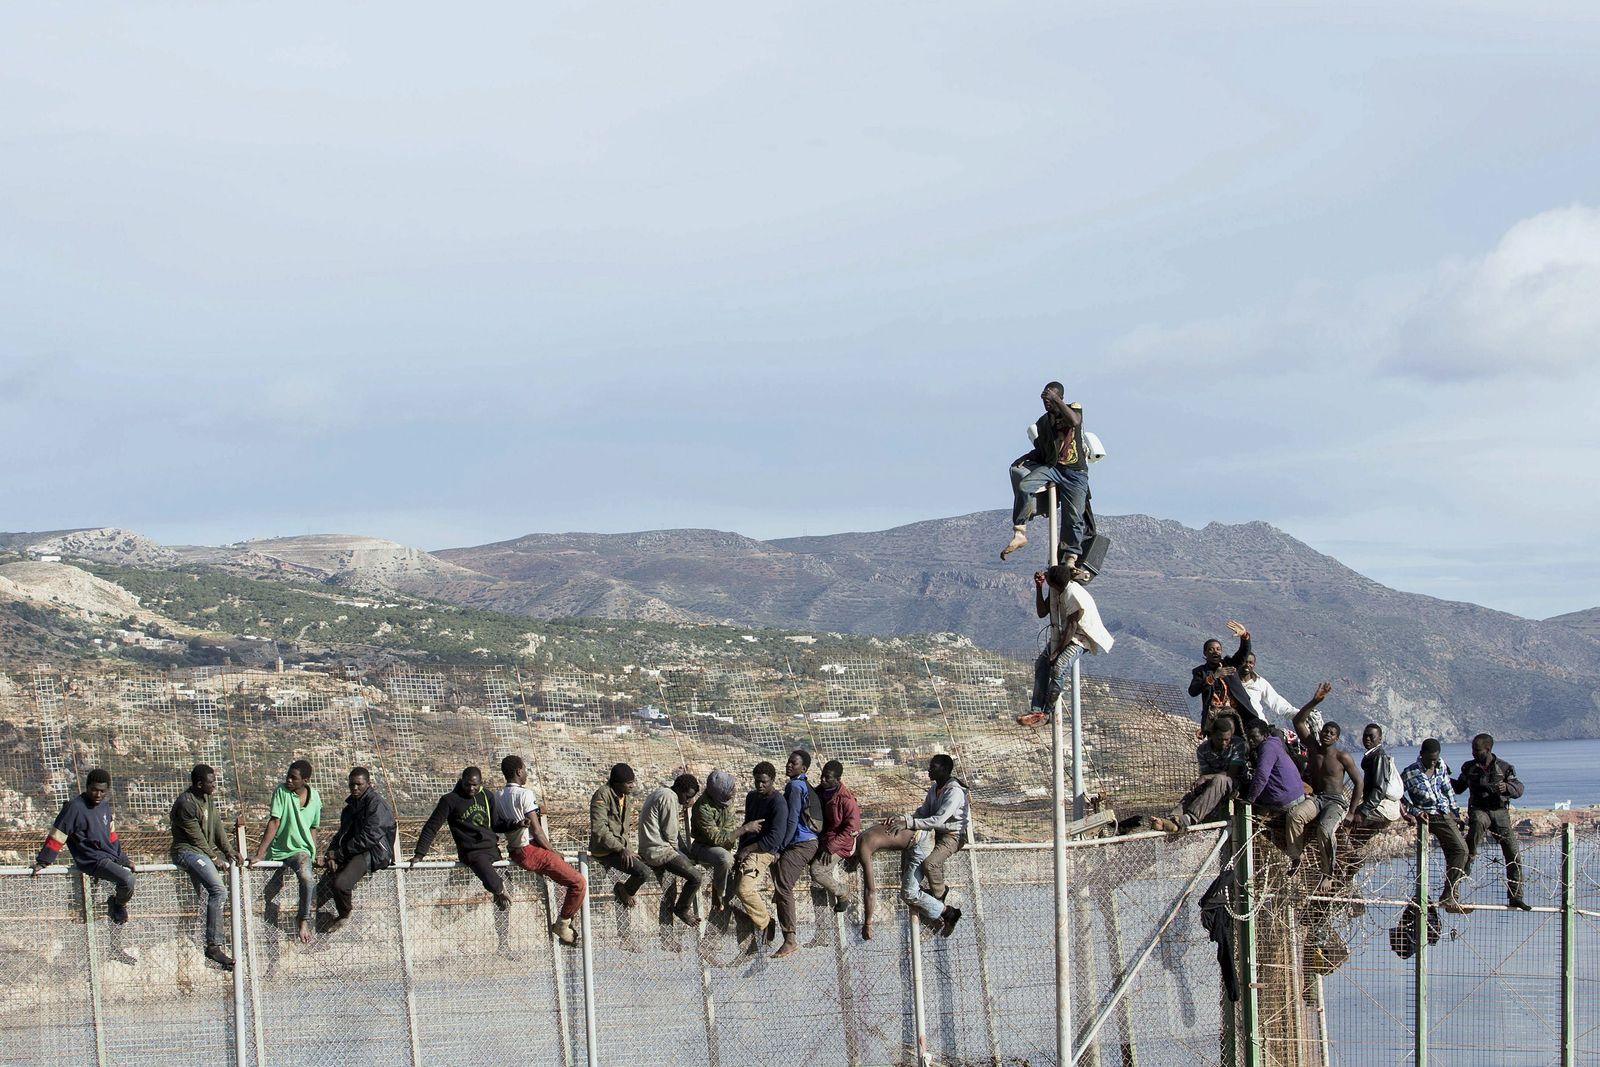 Mauern/ Melilla